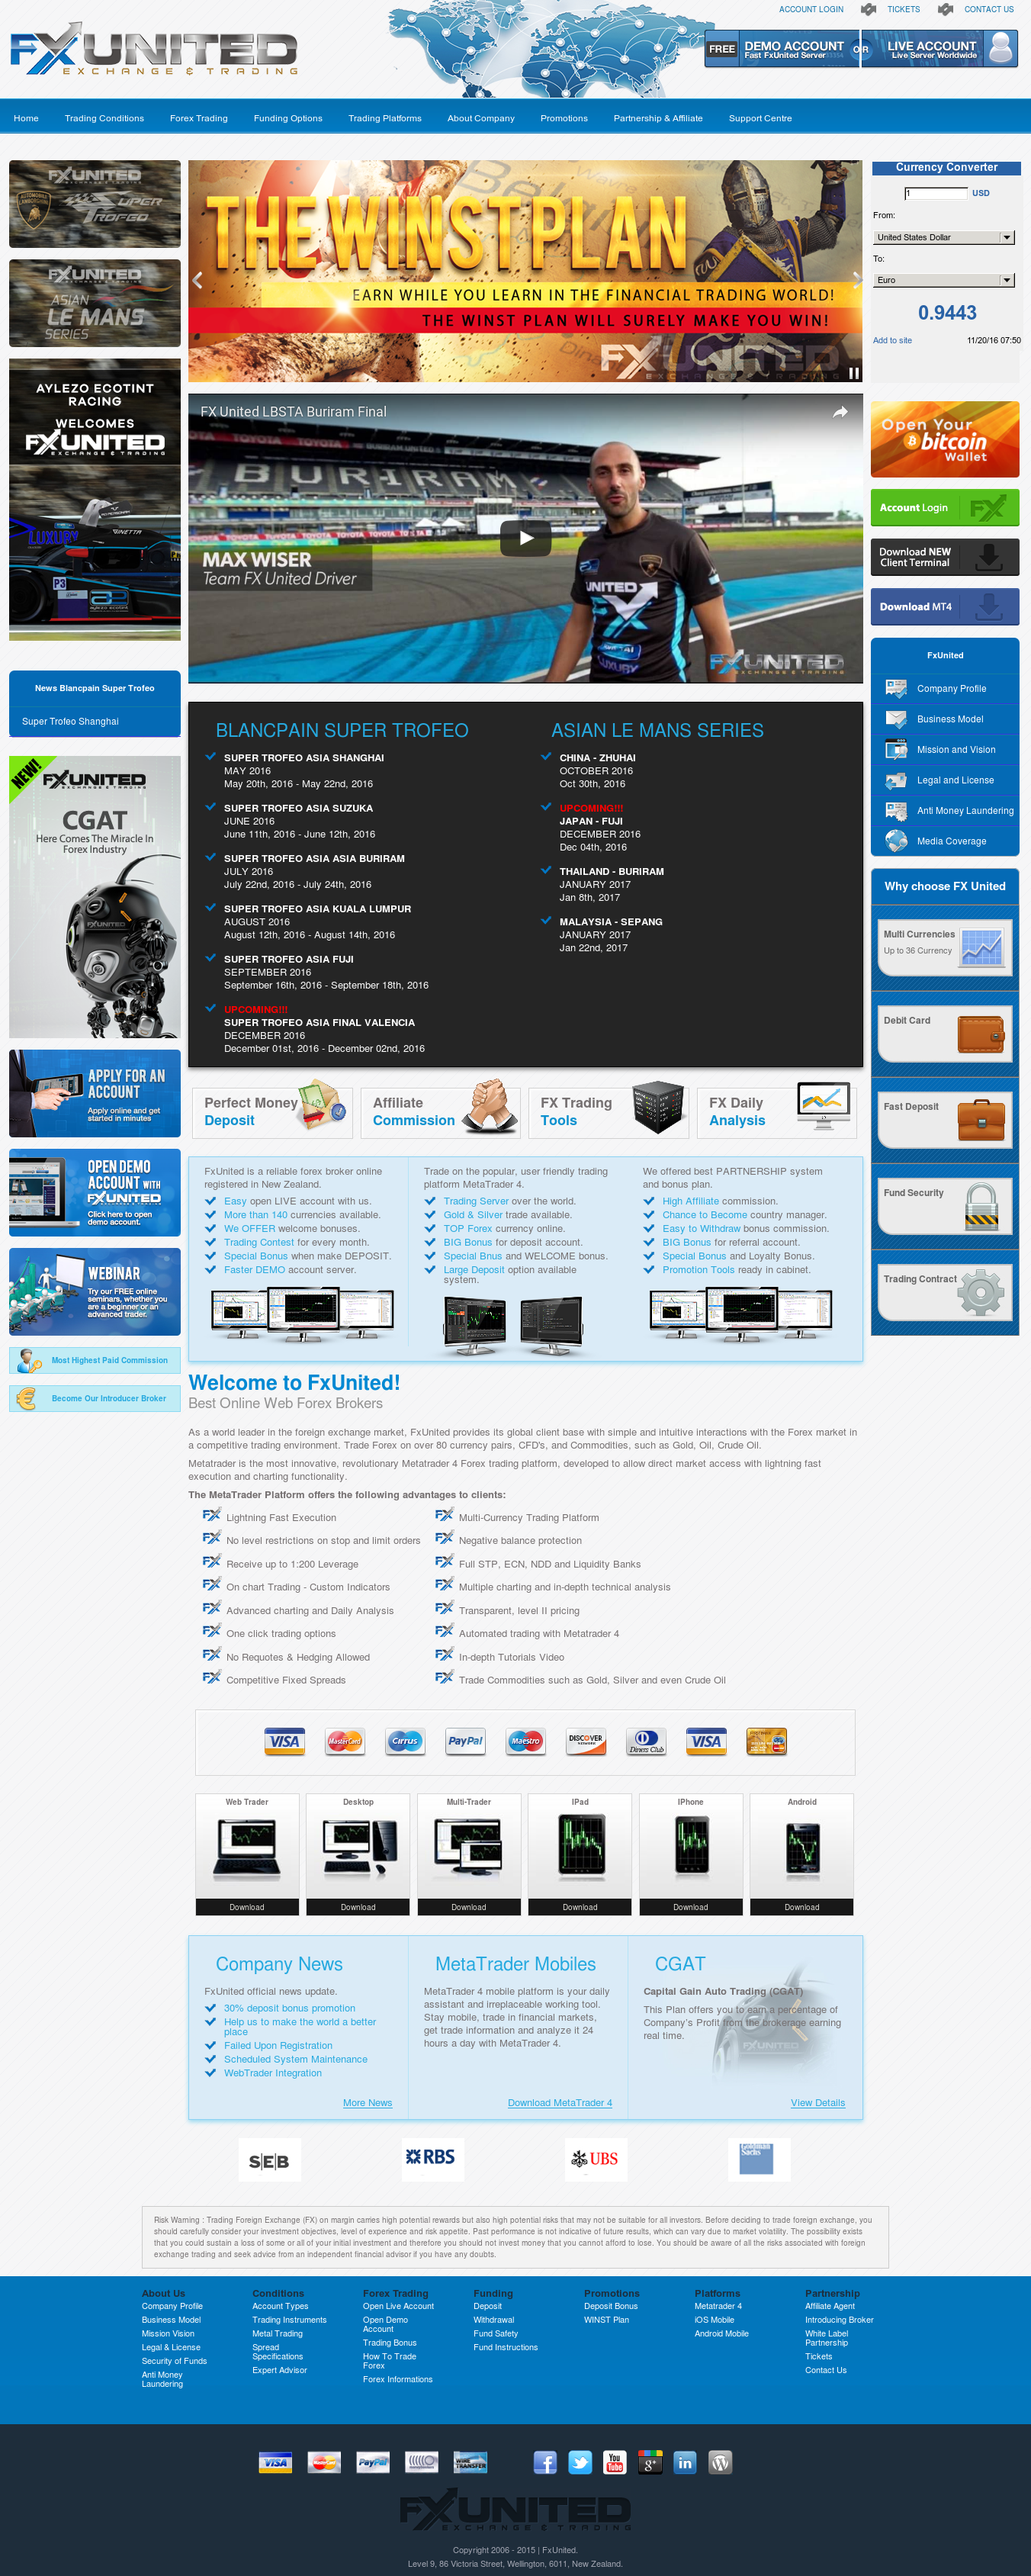 Fxunited - United World Markets Competitors, Revenue and